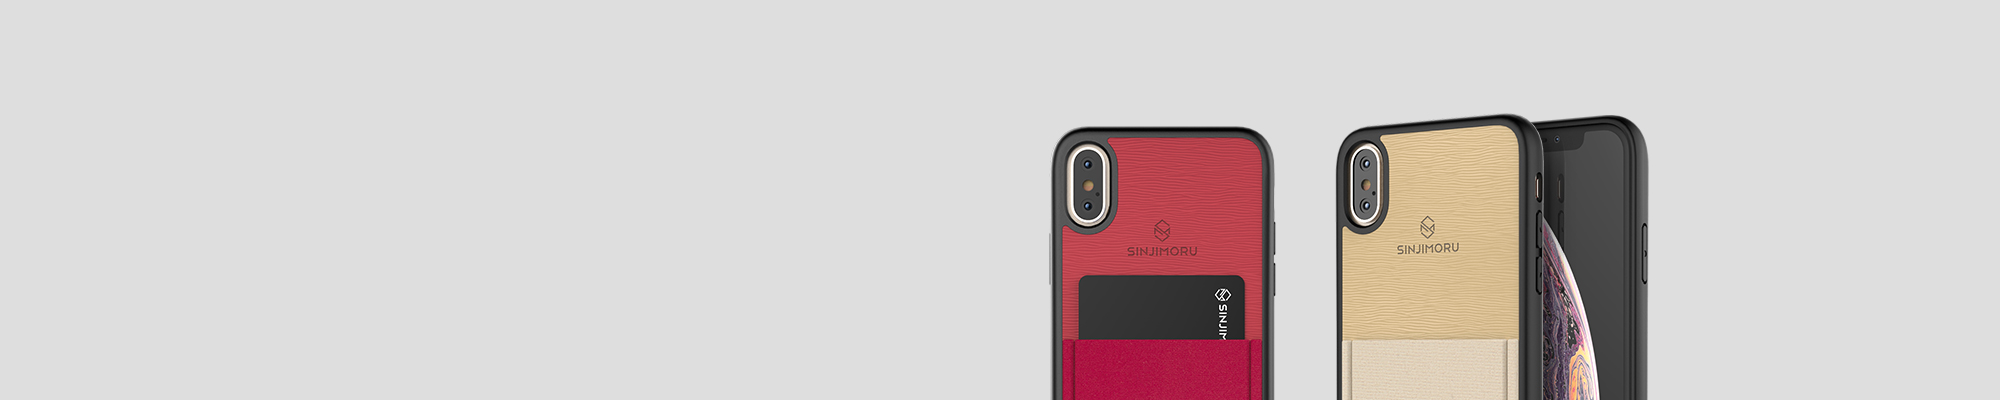 sale retailer 334c2 75664 Sinji Pouch Case for iPhone Max — Sinjimoru